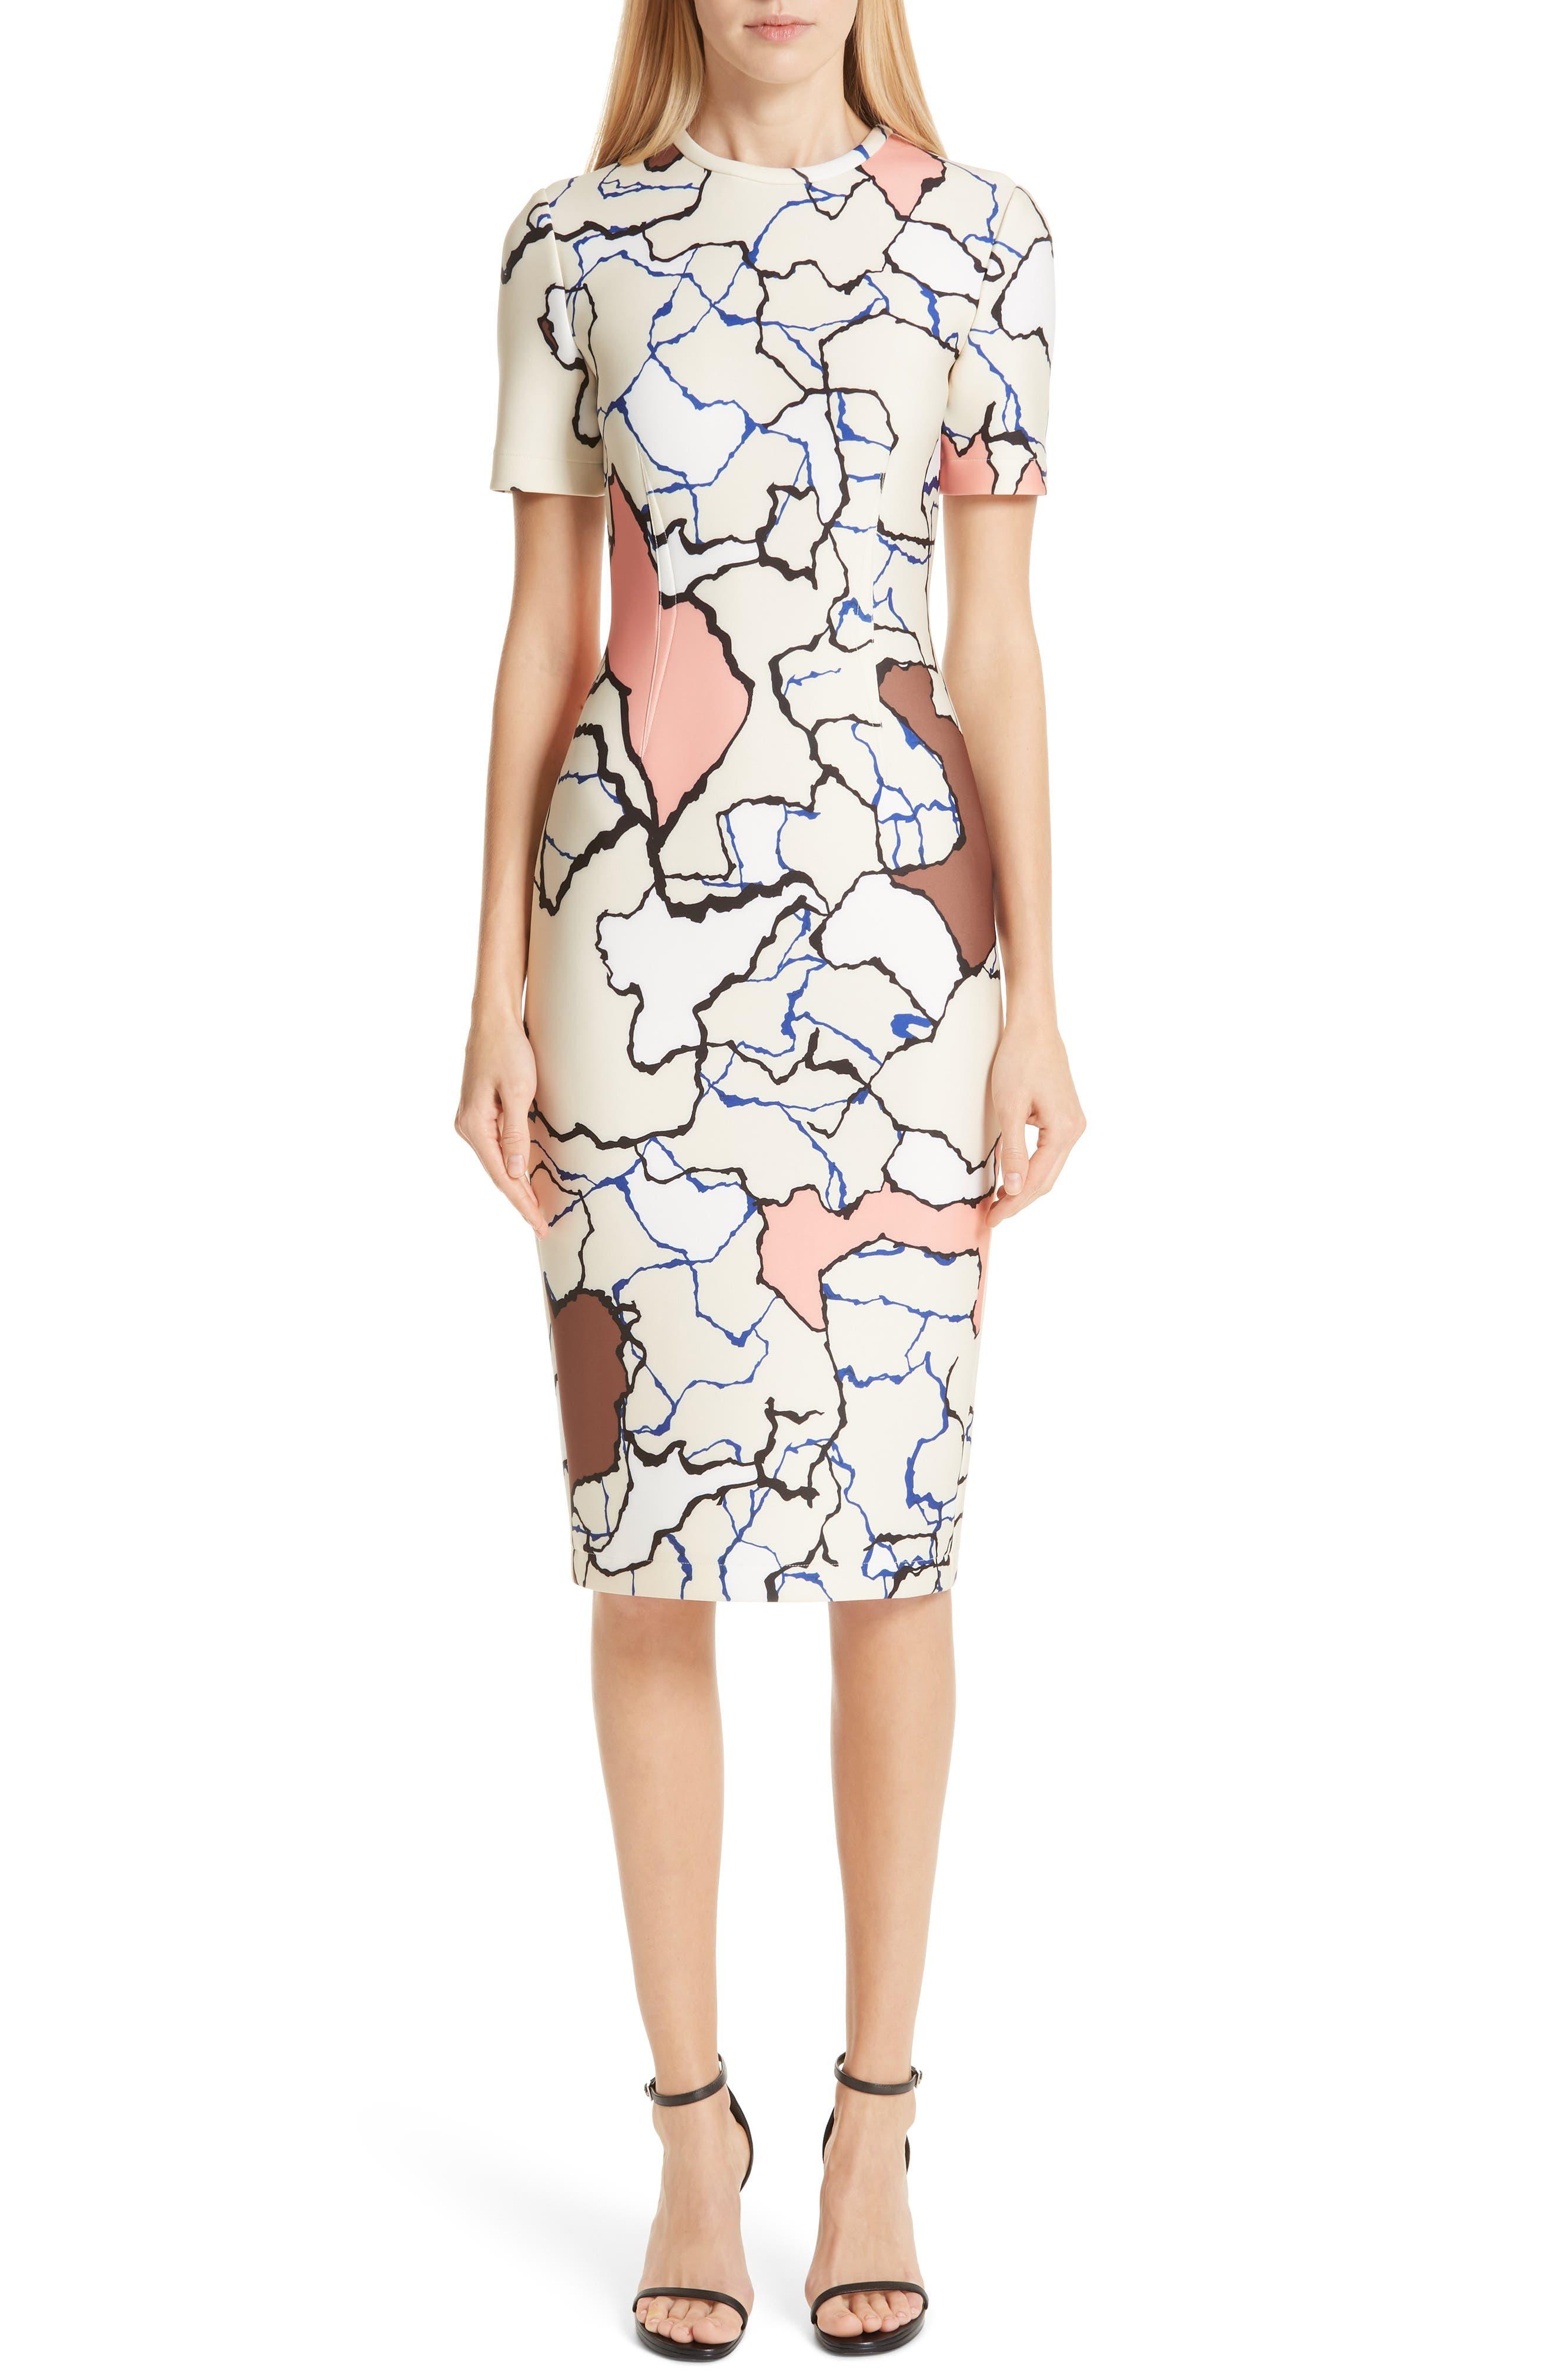 YIGAL AZROUËL Terrazzo Print Scuba Dress, Main, color, MULTI